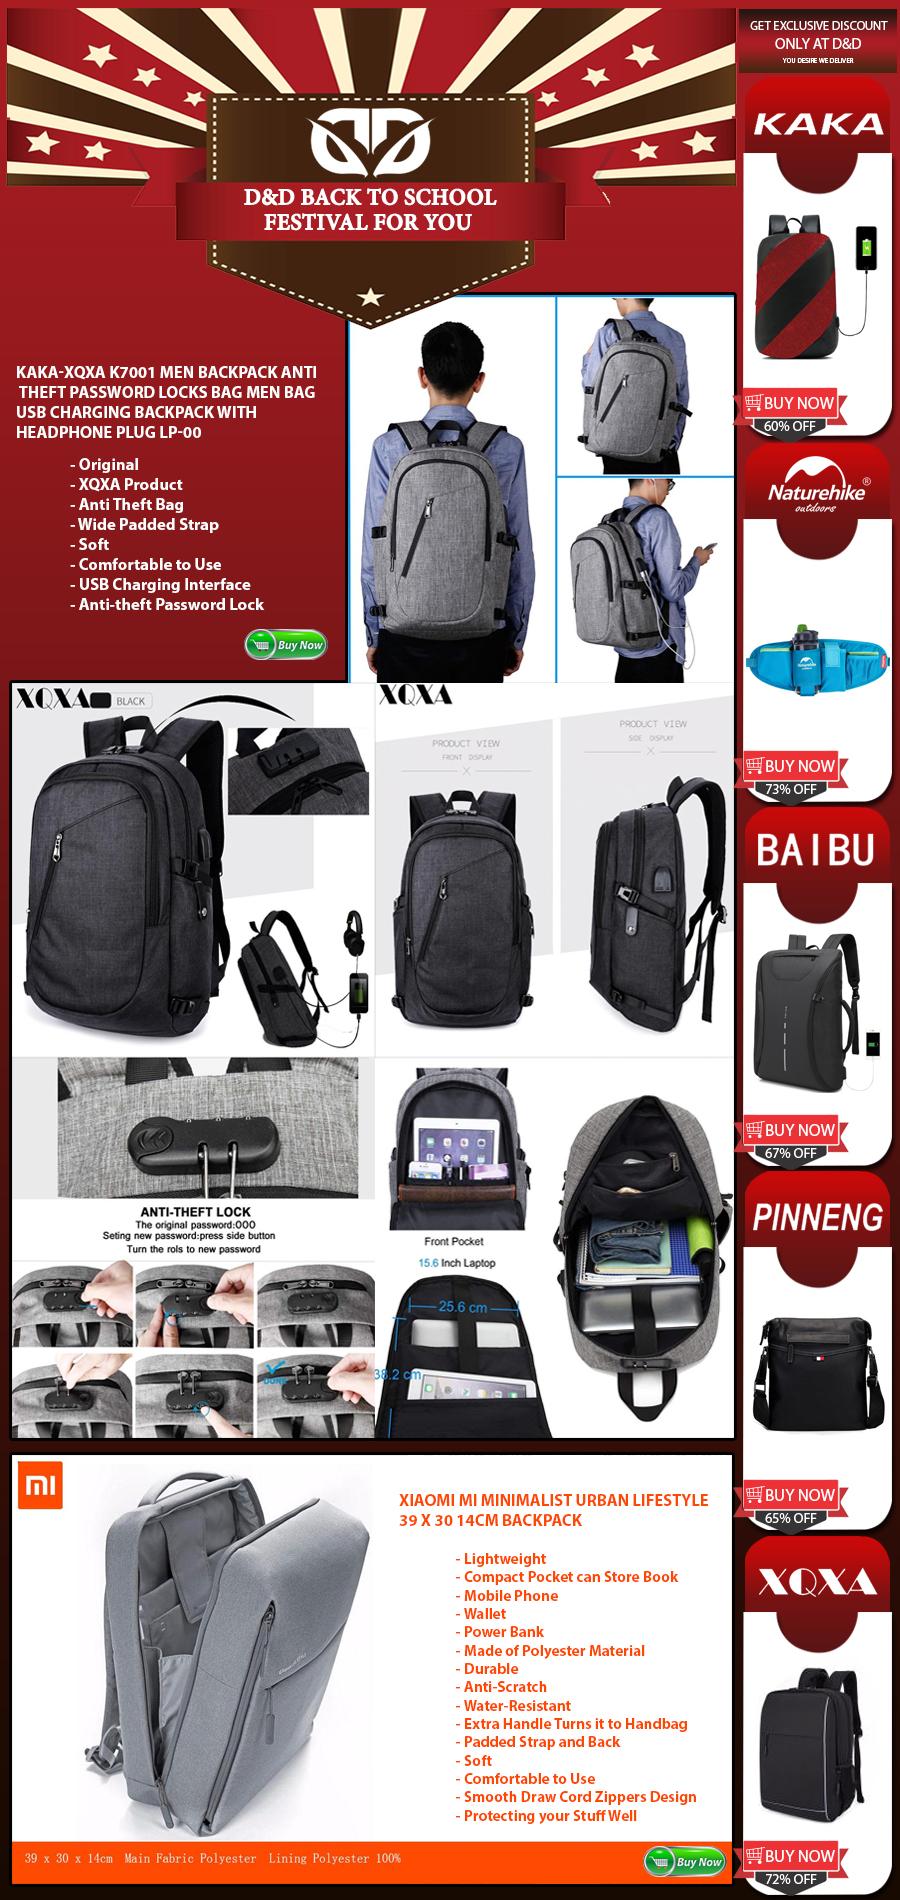 7d4b15a6afac BAIBU New Solar USB Charging Backpack 15 Inch Laptop Backpack Business  Waterproof Bag For Men Travel Anti-theft (Baibu01) LP-00